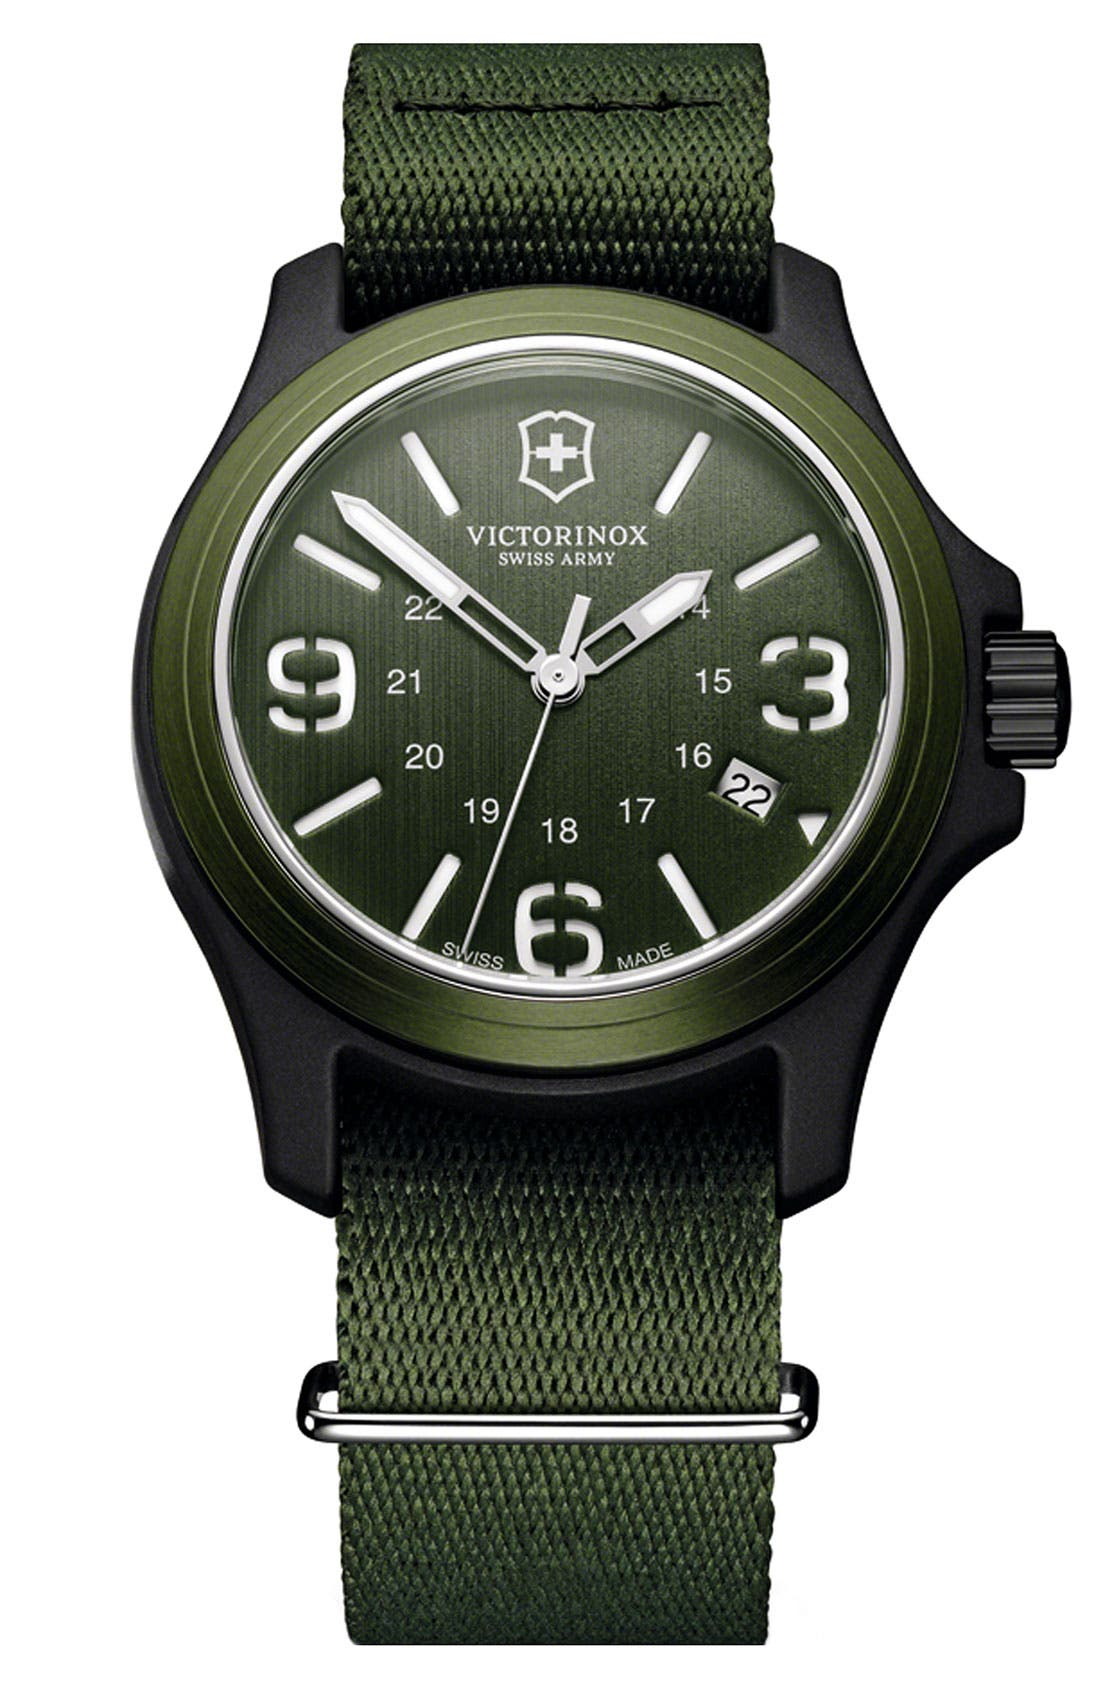 Alternate Image 1 Selected - Victorinox Swiss Army® 'Original' Nylon Strap Watch, 40mm